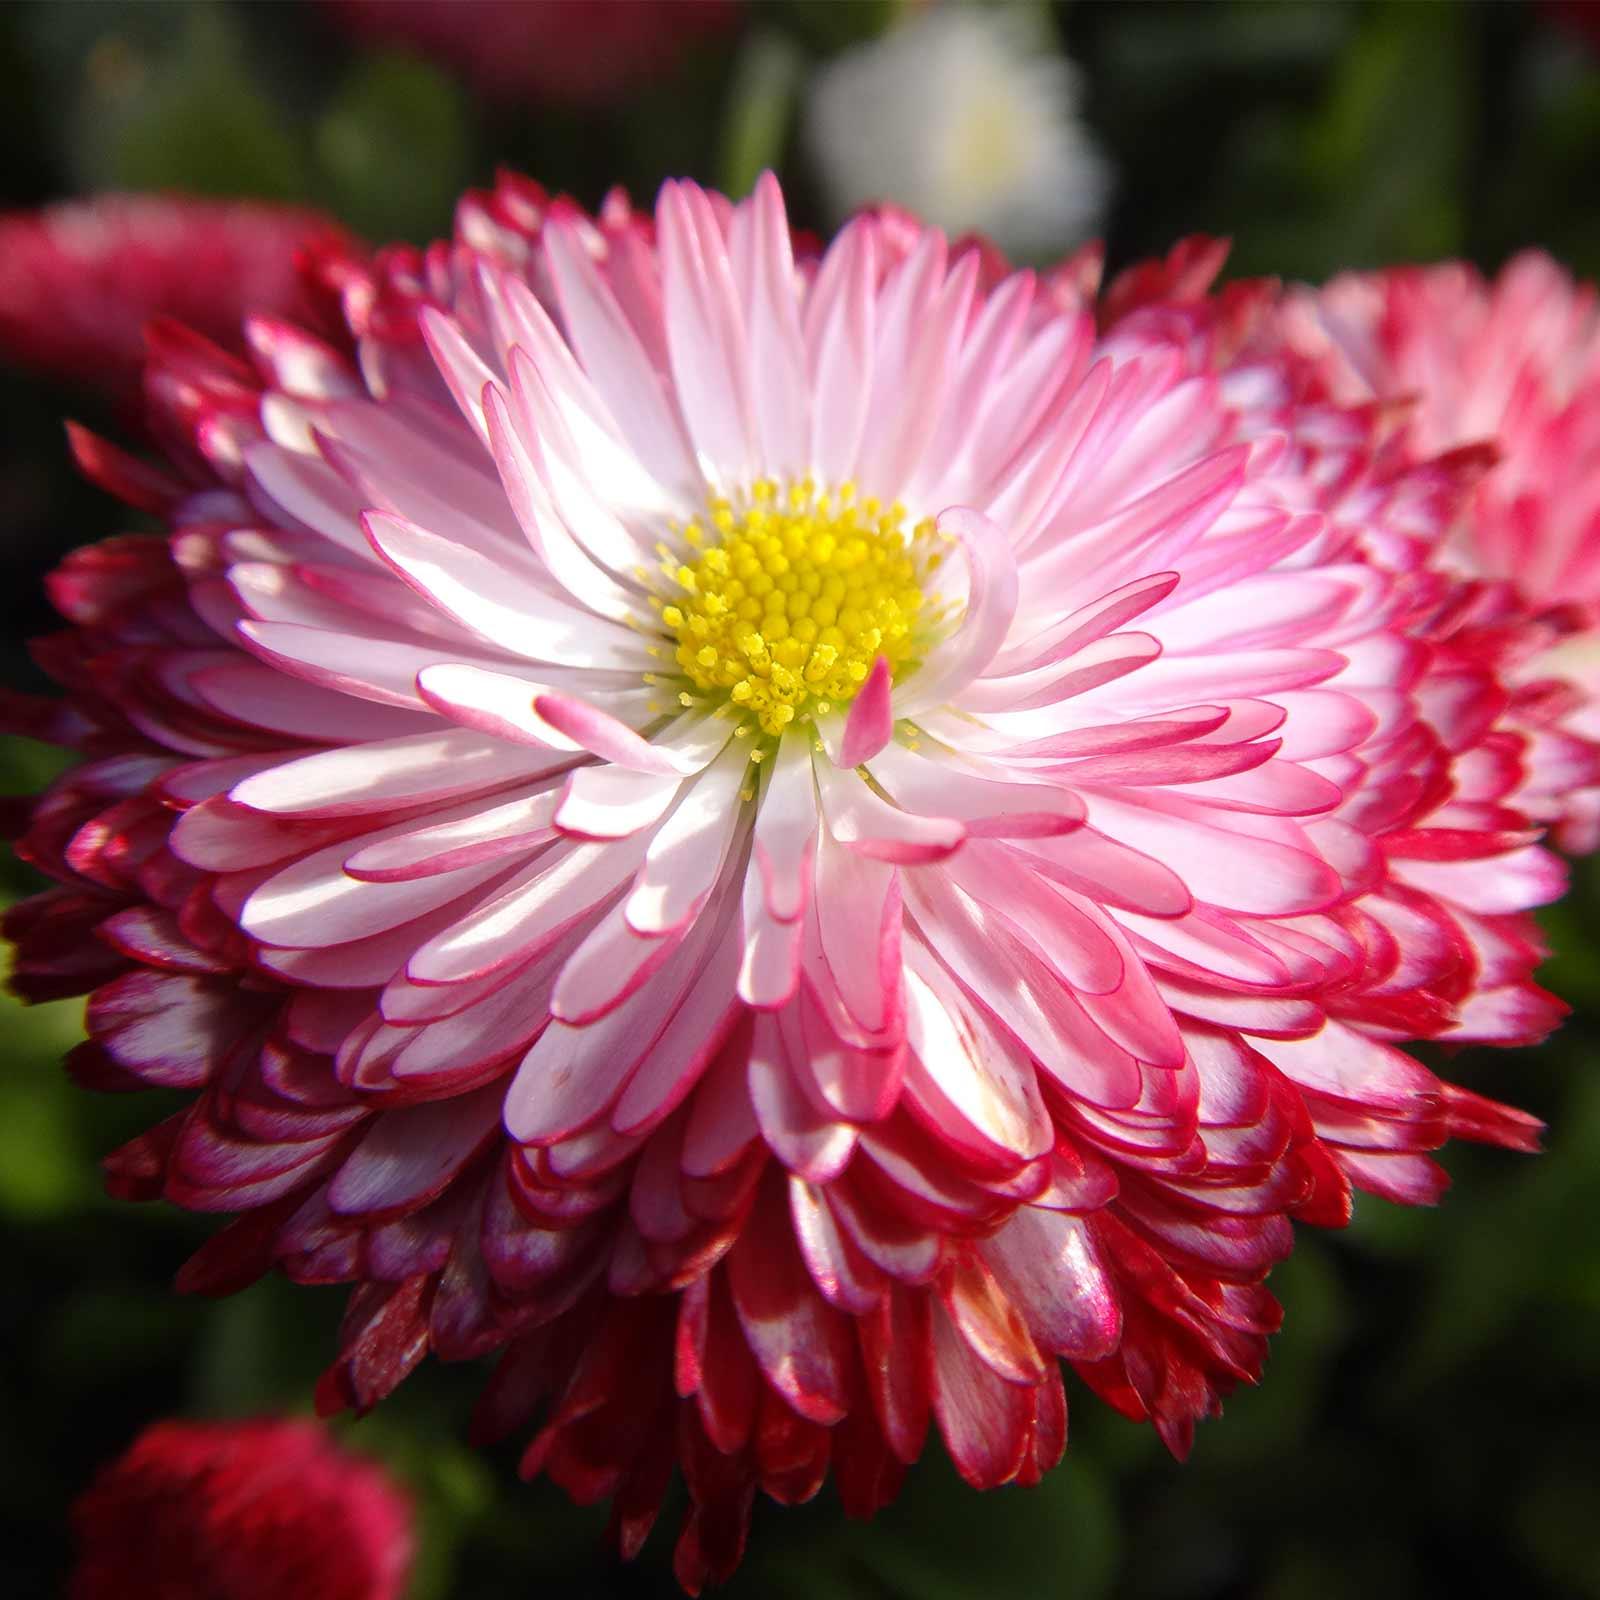 Bellis english daisy habanera mix 1000 flower seeds mix bellis english daisy habanera mix 1000 flower seeds mix perennial izmirmasajfo